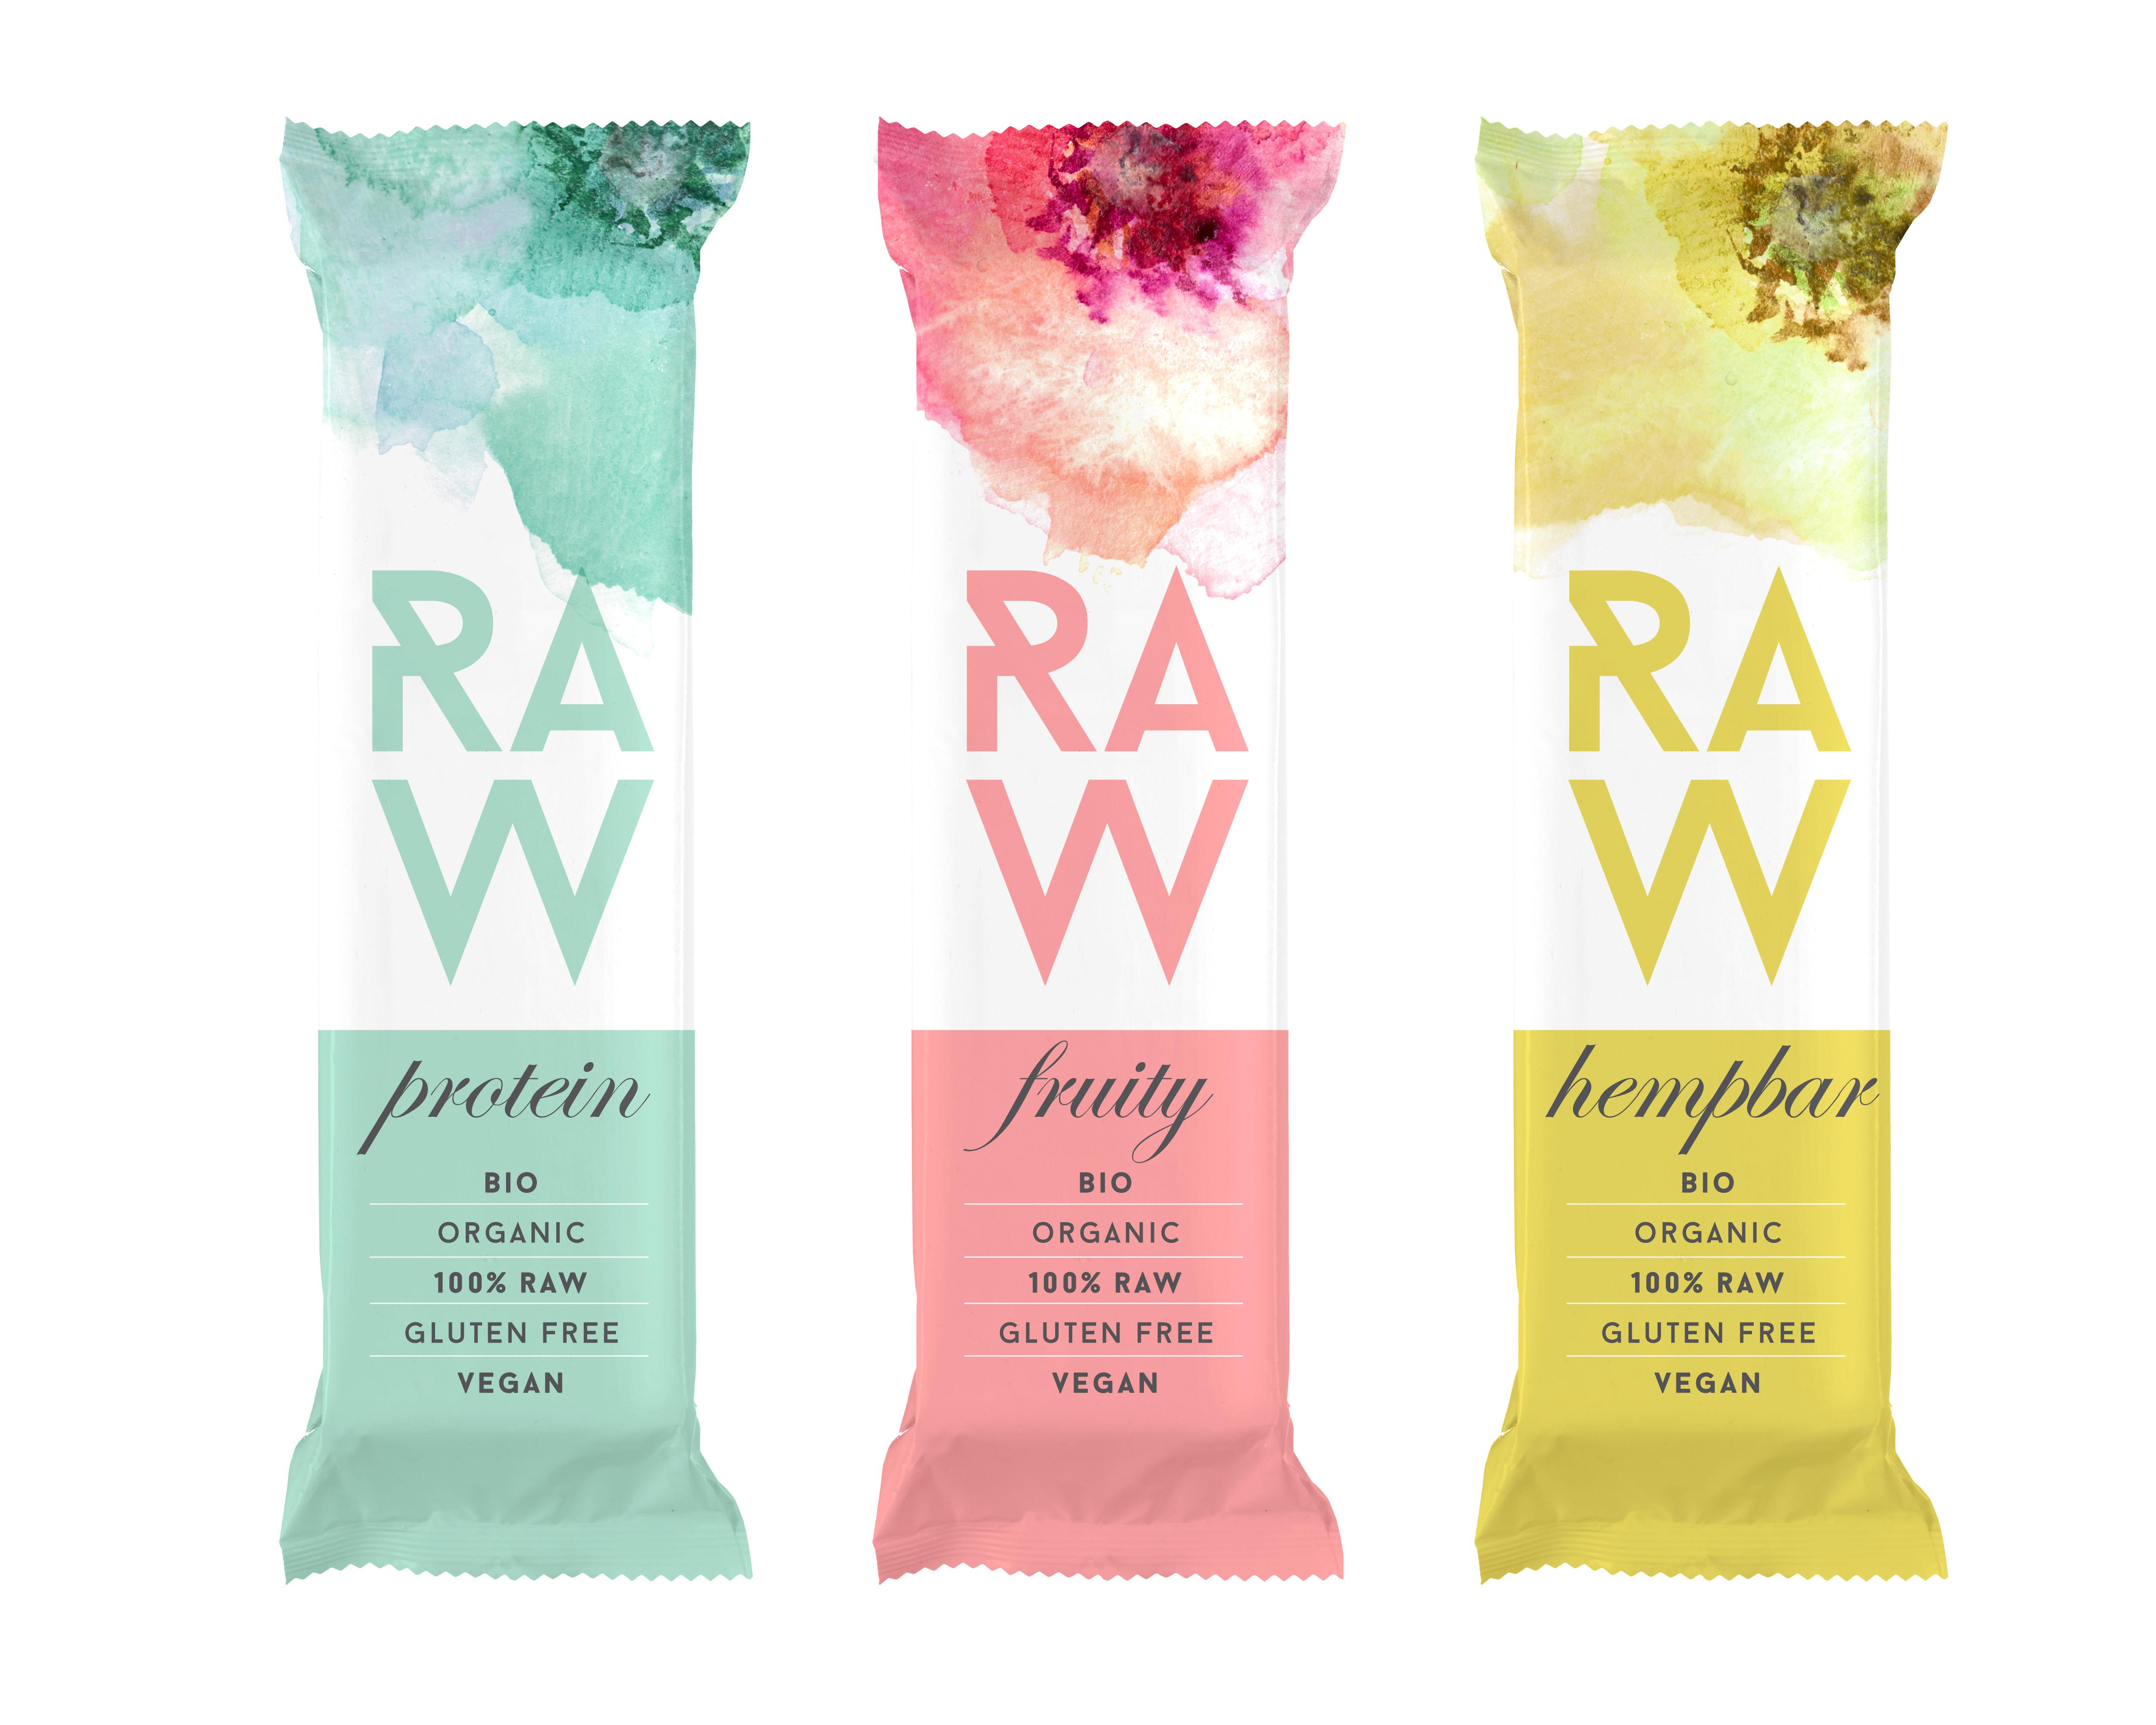 raw01